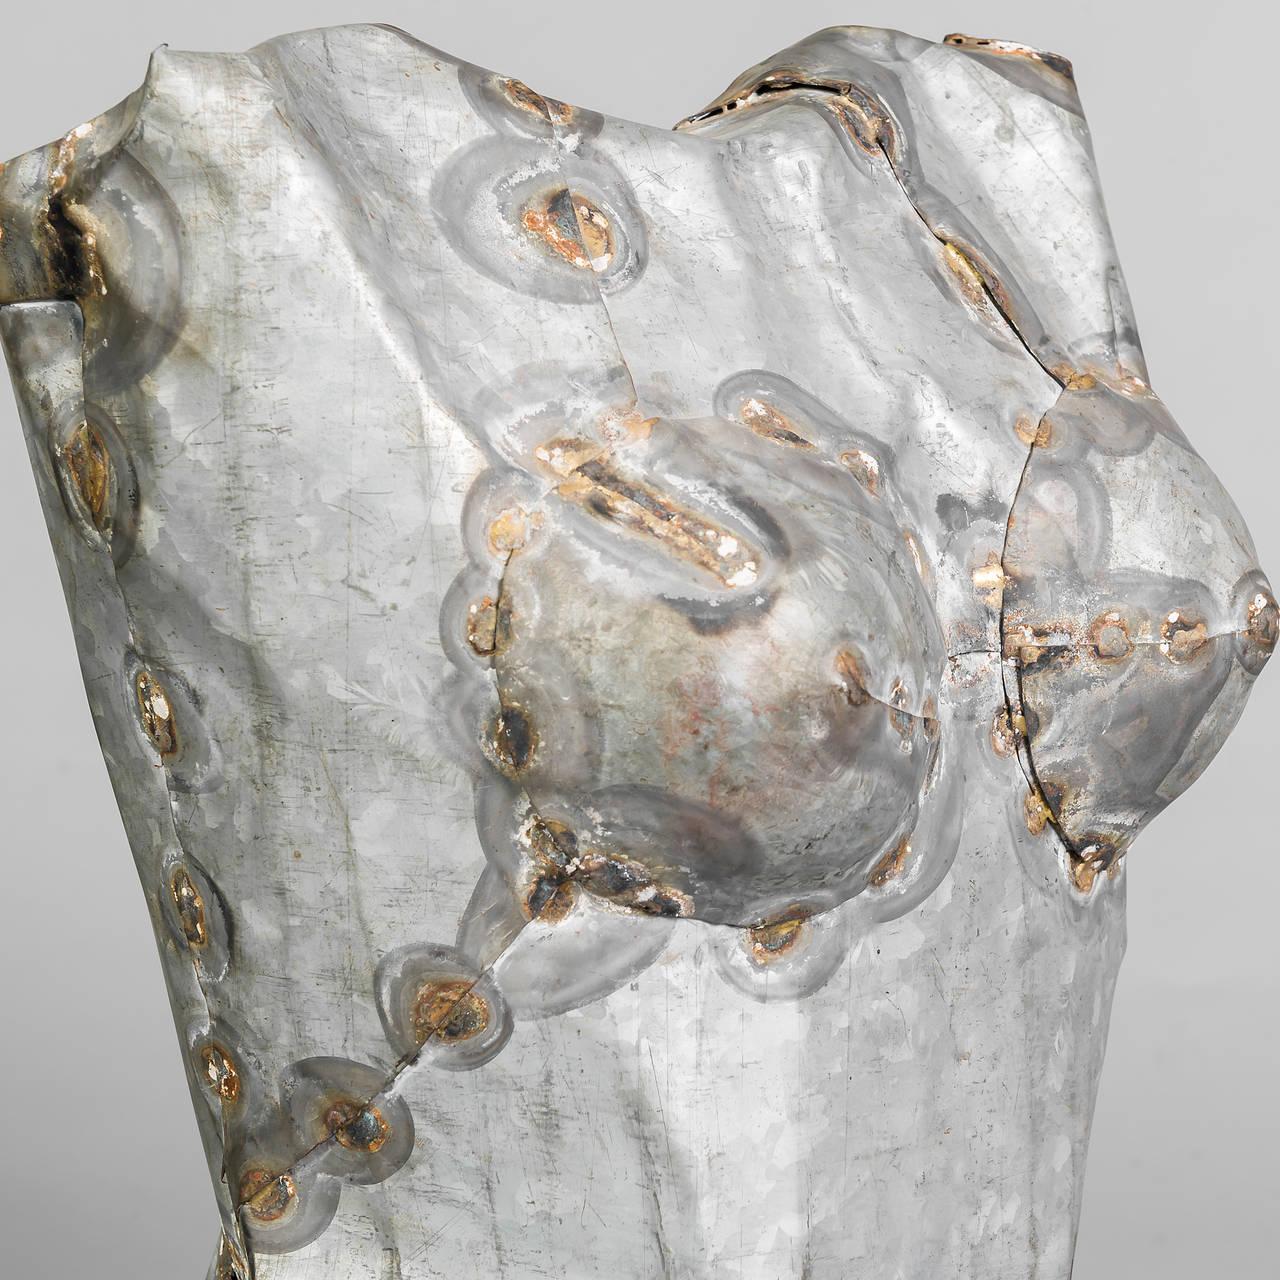 Mid-20th Century Pair of Torso Sculptures in Zinc For Sale